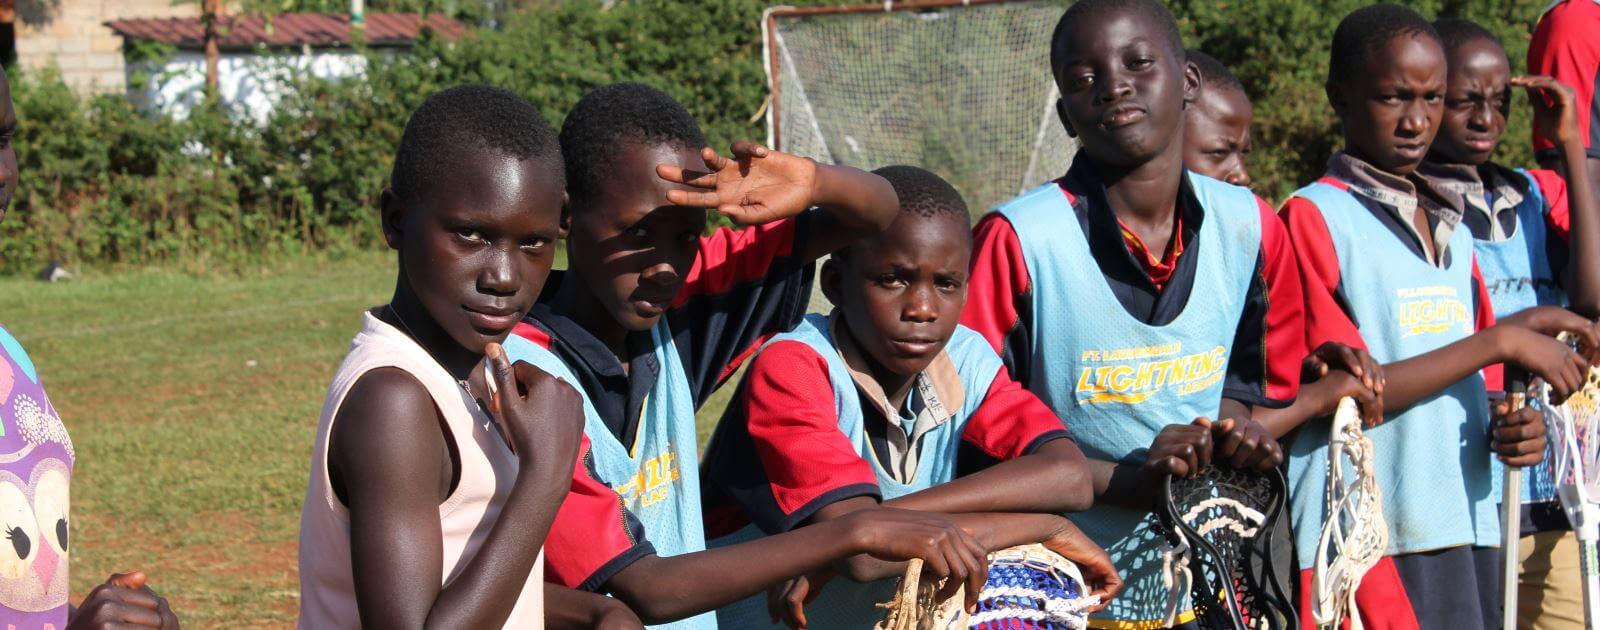 Kids Lacrosse Africa